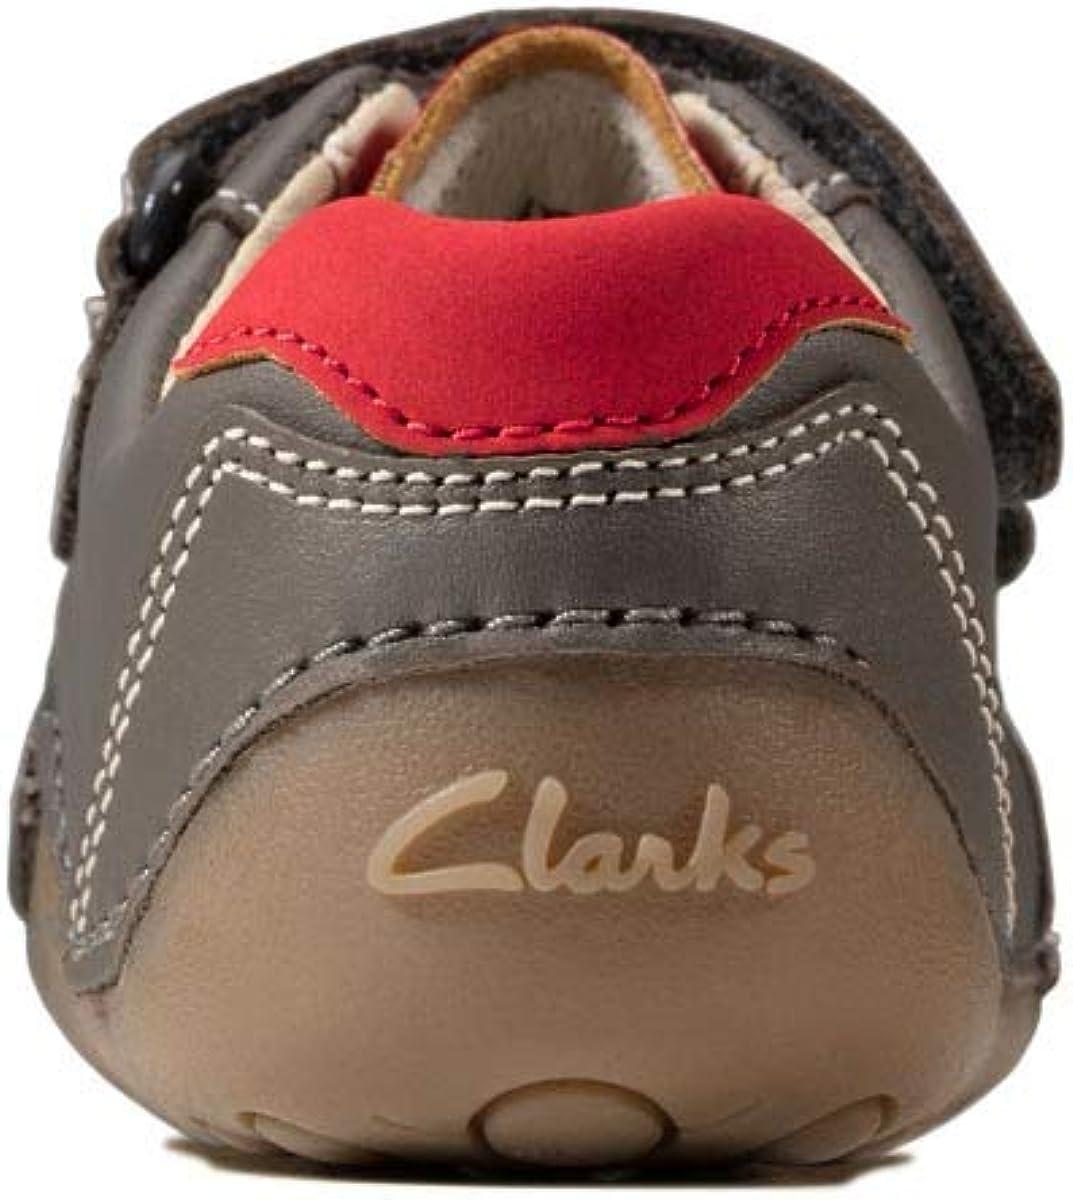 Clarks 470046F Tiny Dusk T Grey matt Leather Kids First Shoes